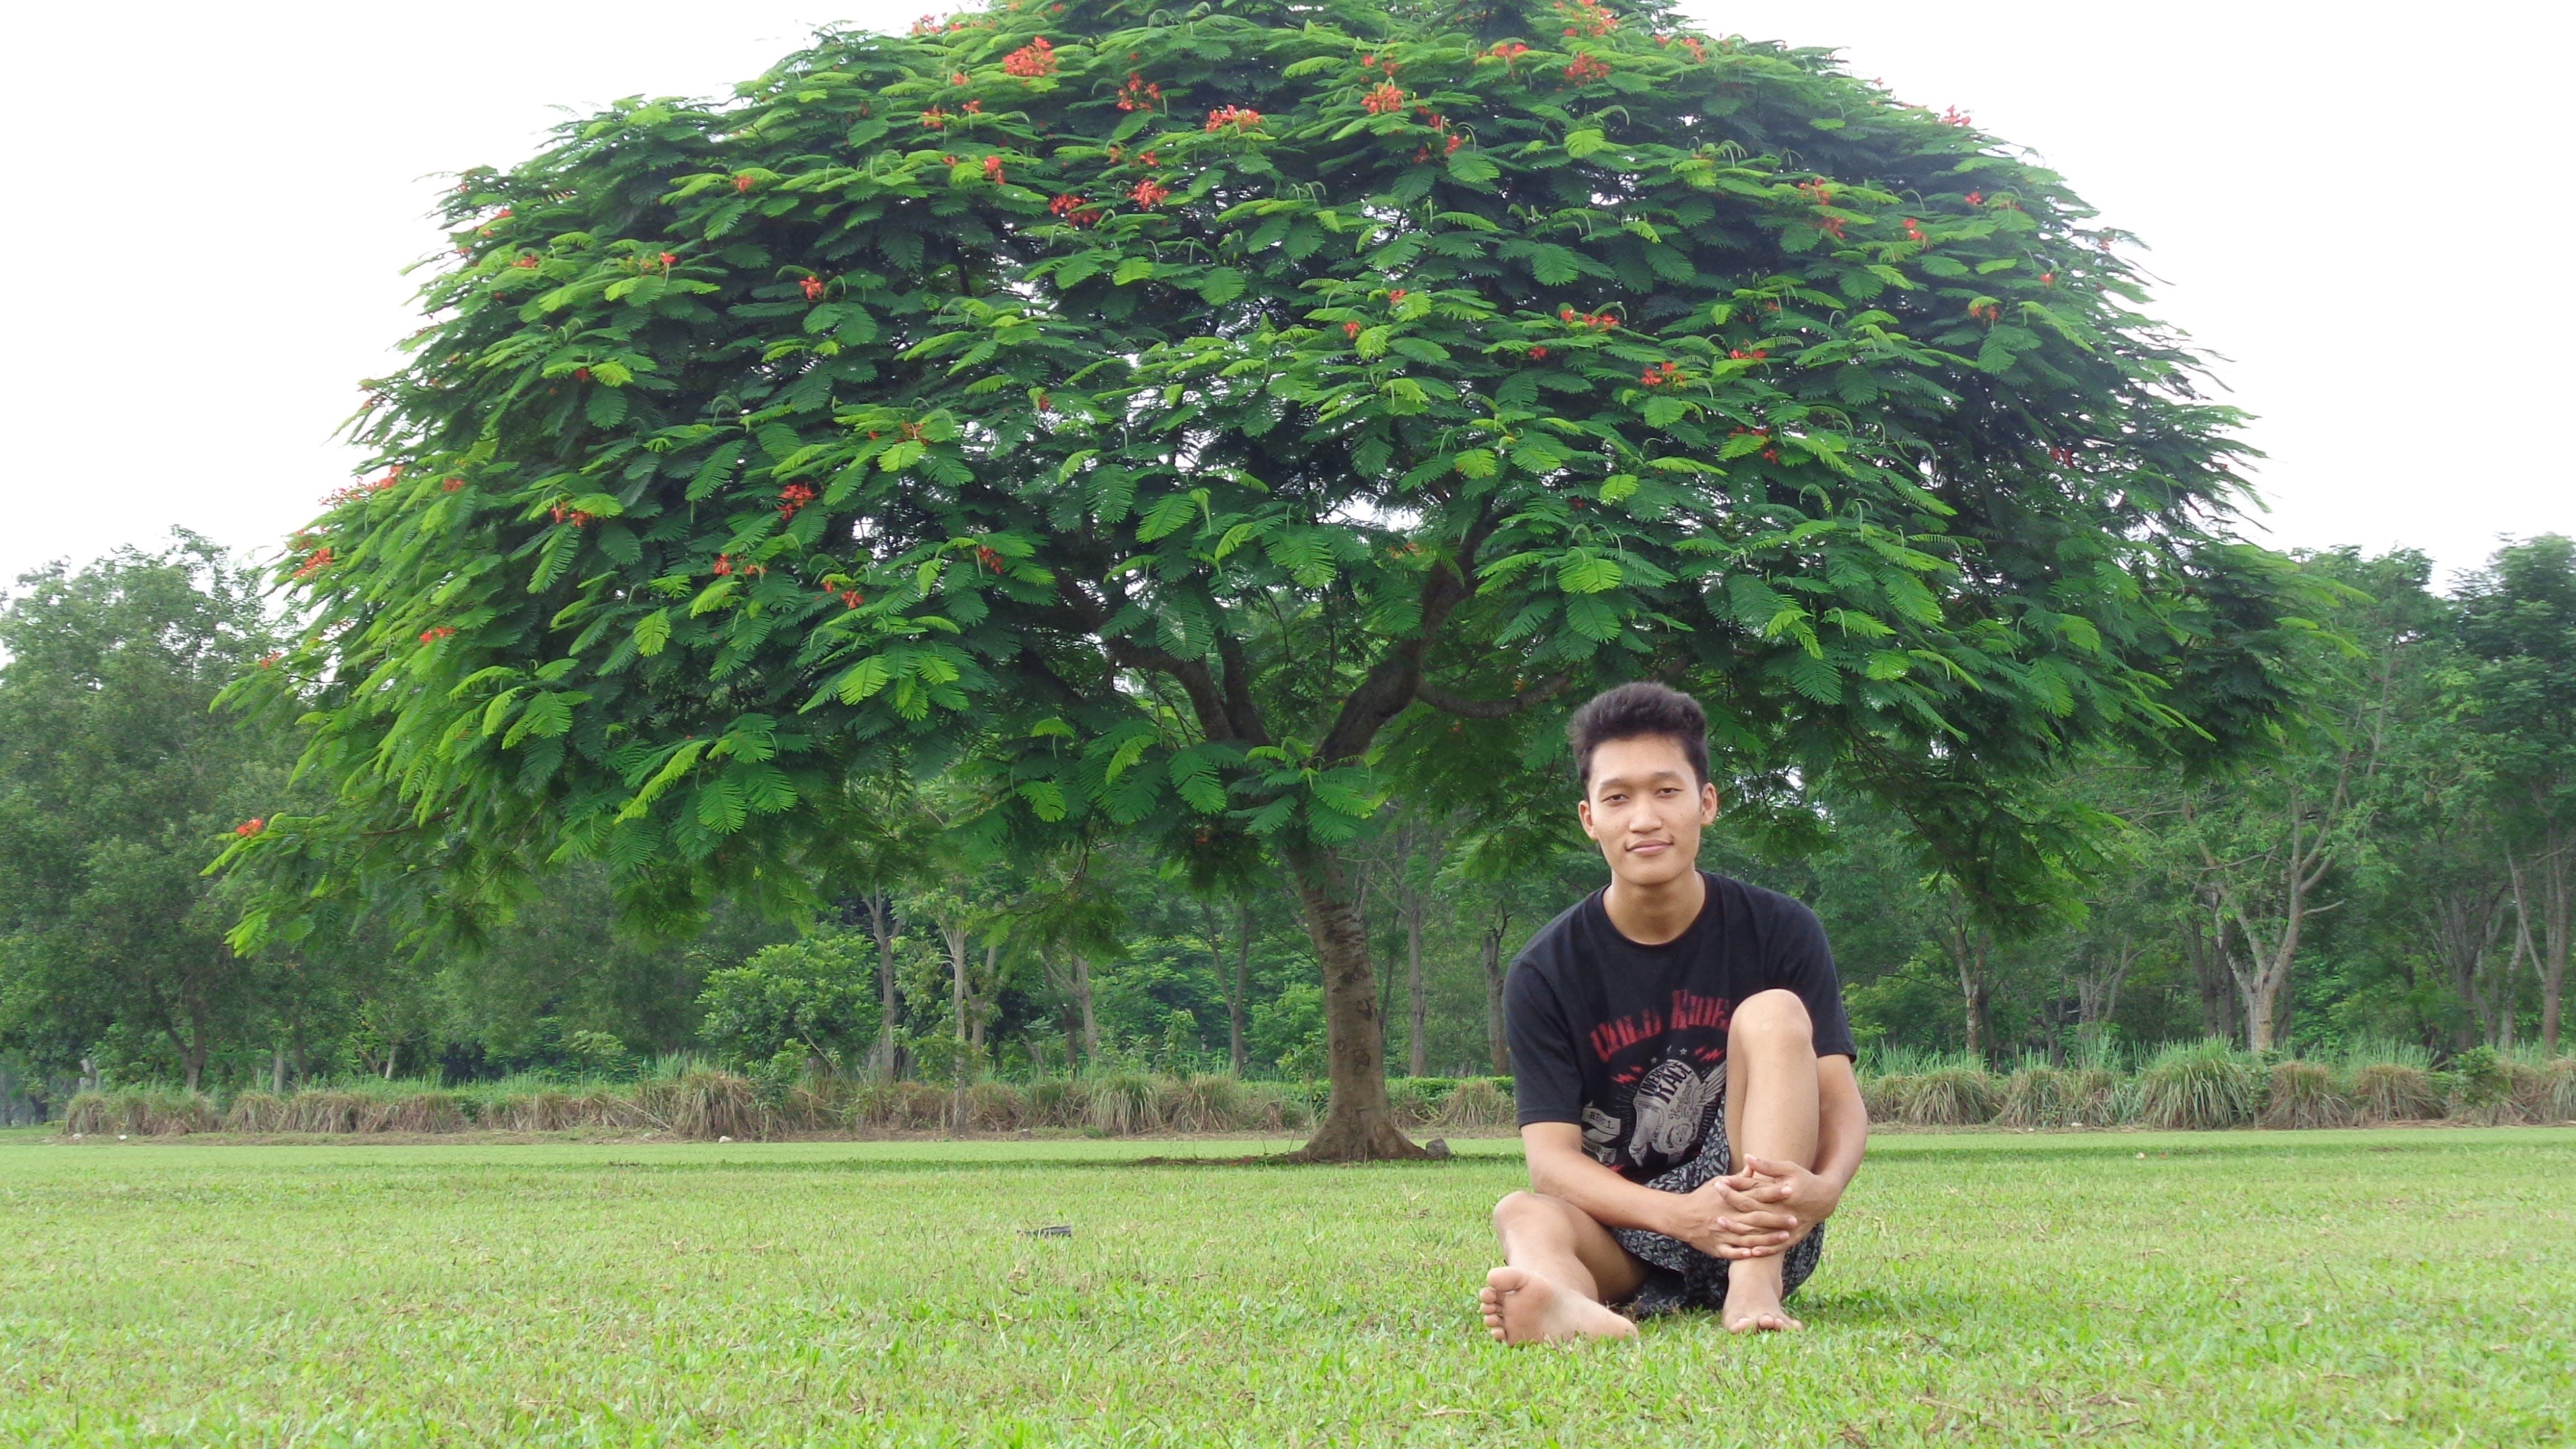 Man in Black Shirt Sitting on Grass Field